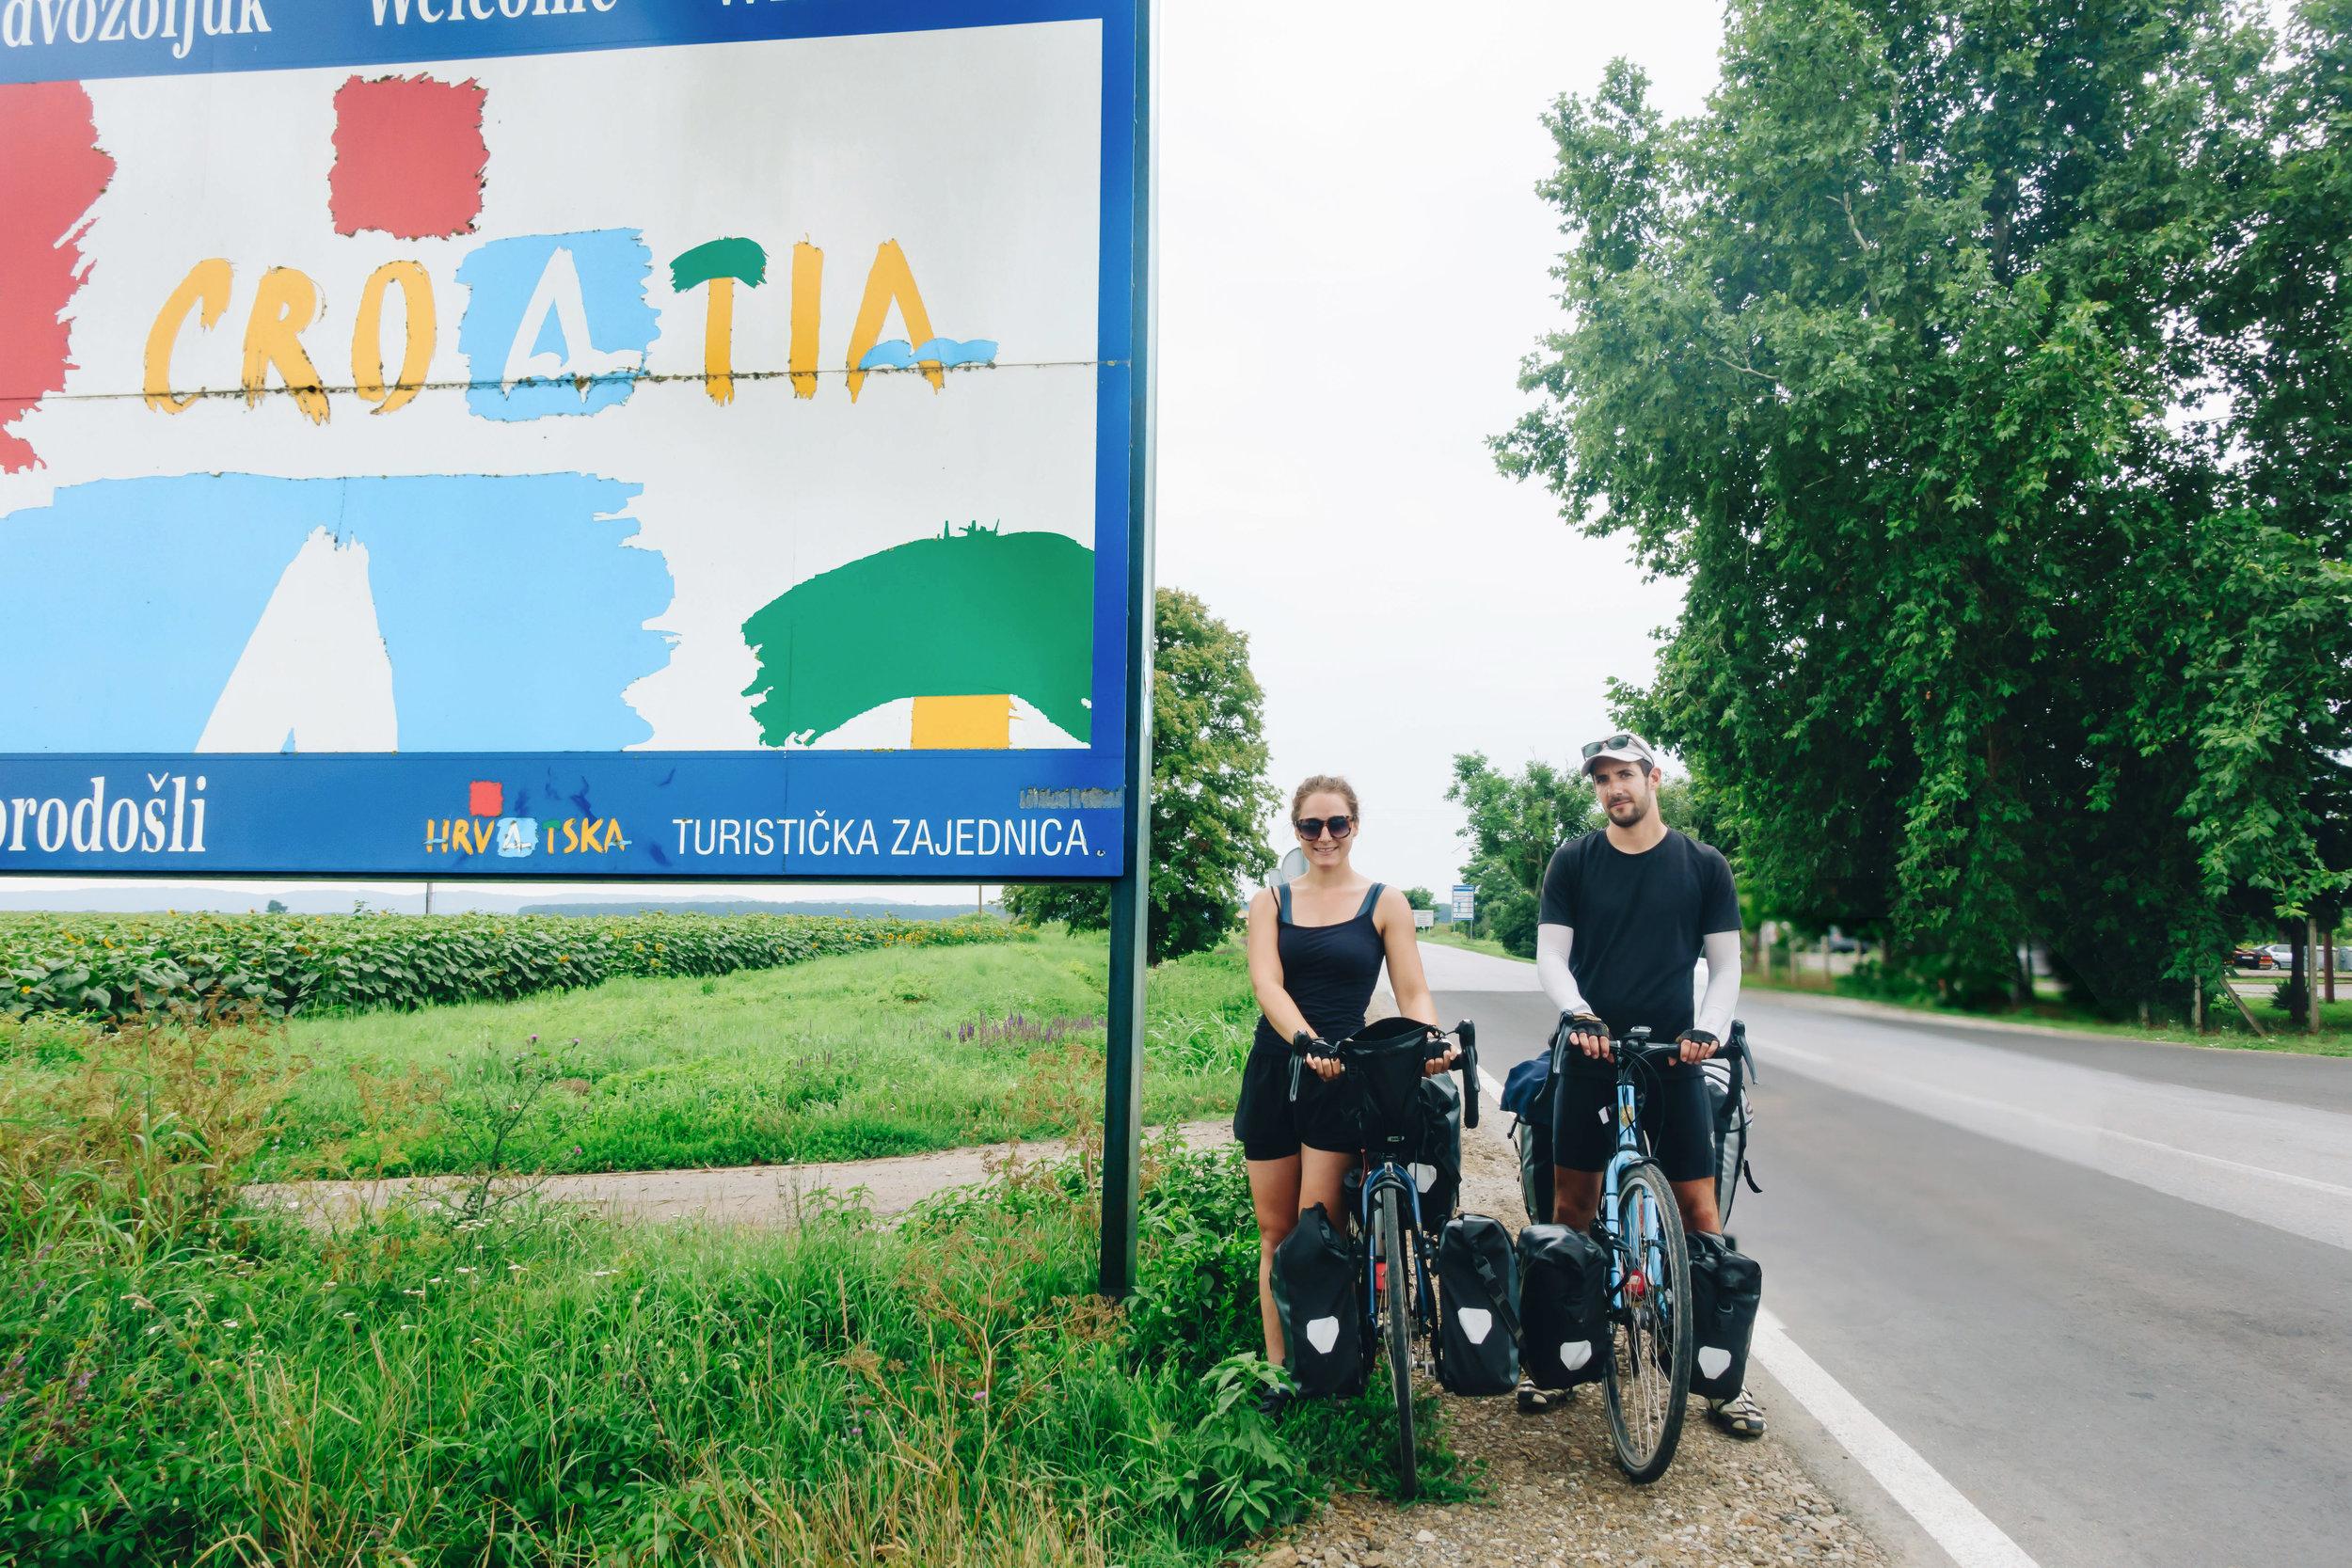 Welcome to Croatia!